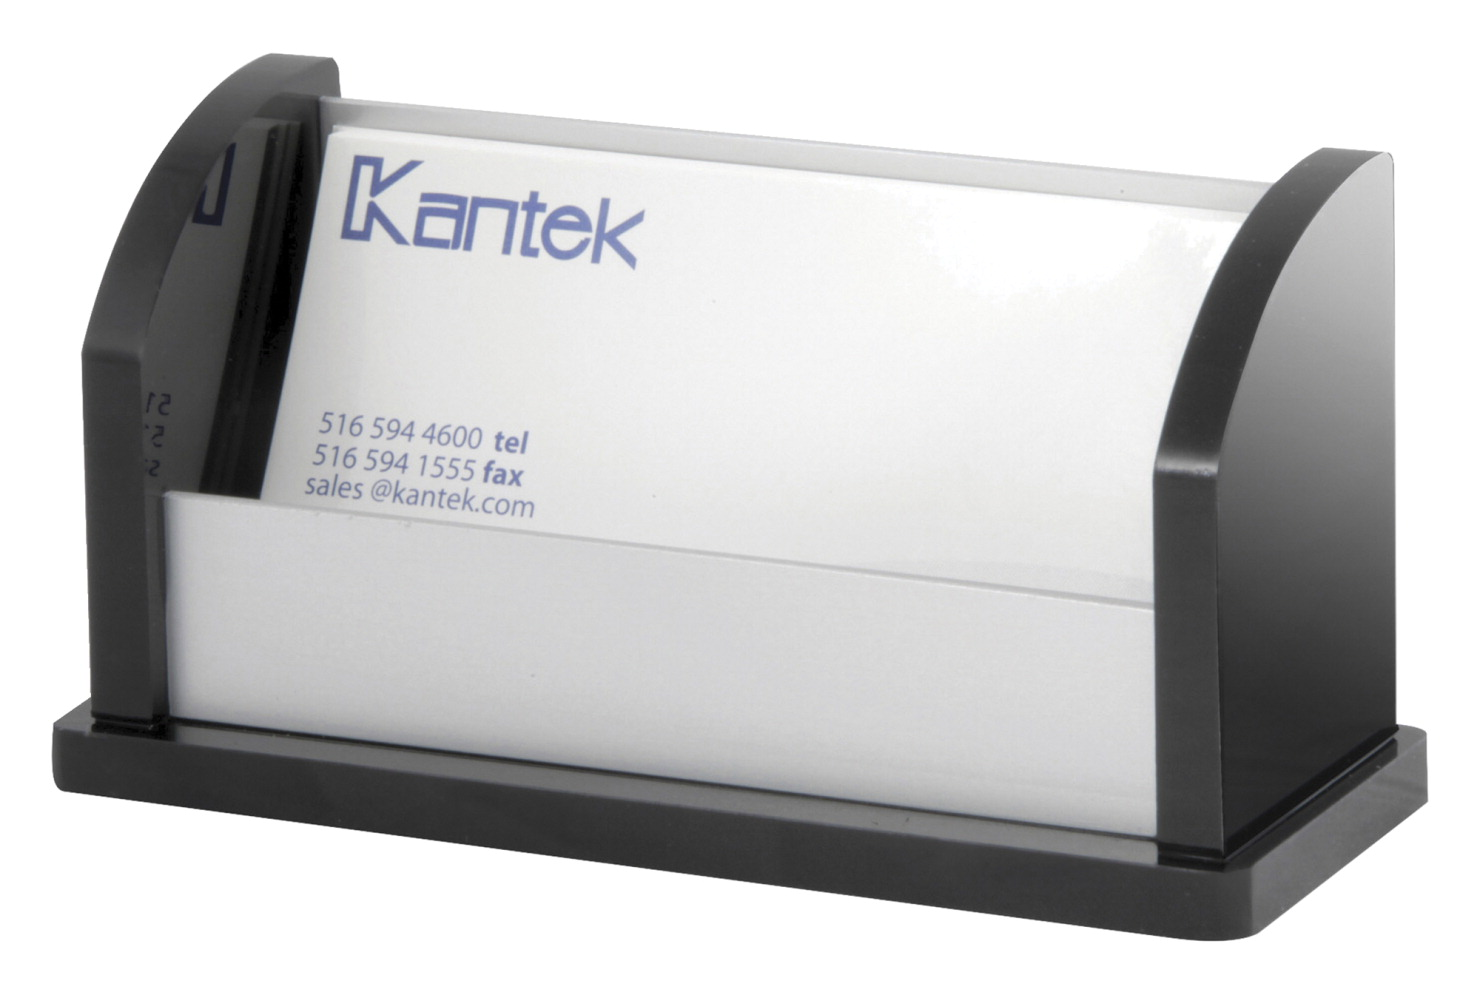 Kantek Acrylic Aluminum Business Card Holder 80 Cards Black